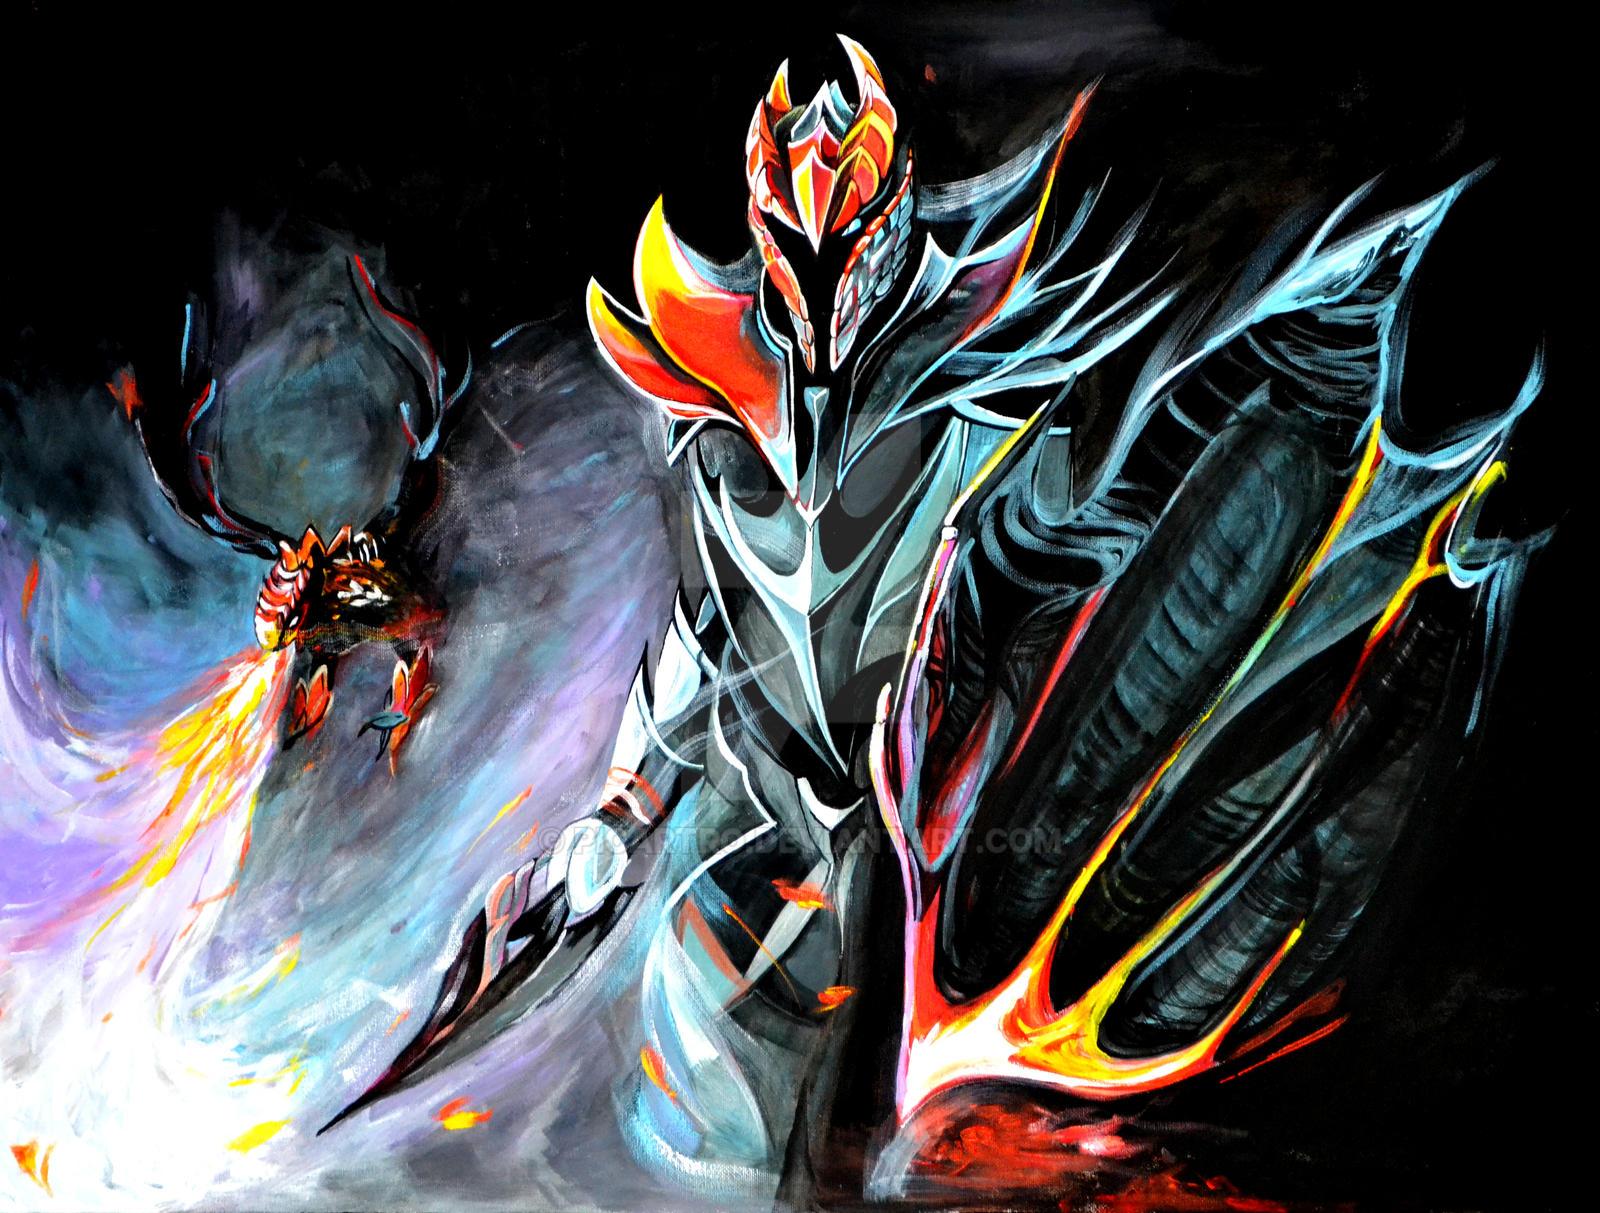 Dota2 dragon knight by picartro on deviantart dota2 dragon knight print by picartro voltagebd Gallery